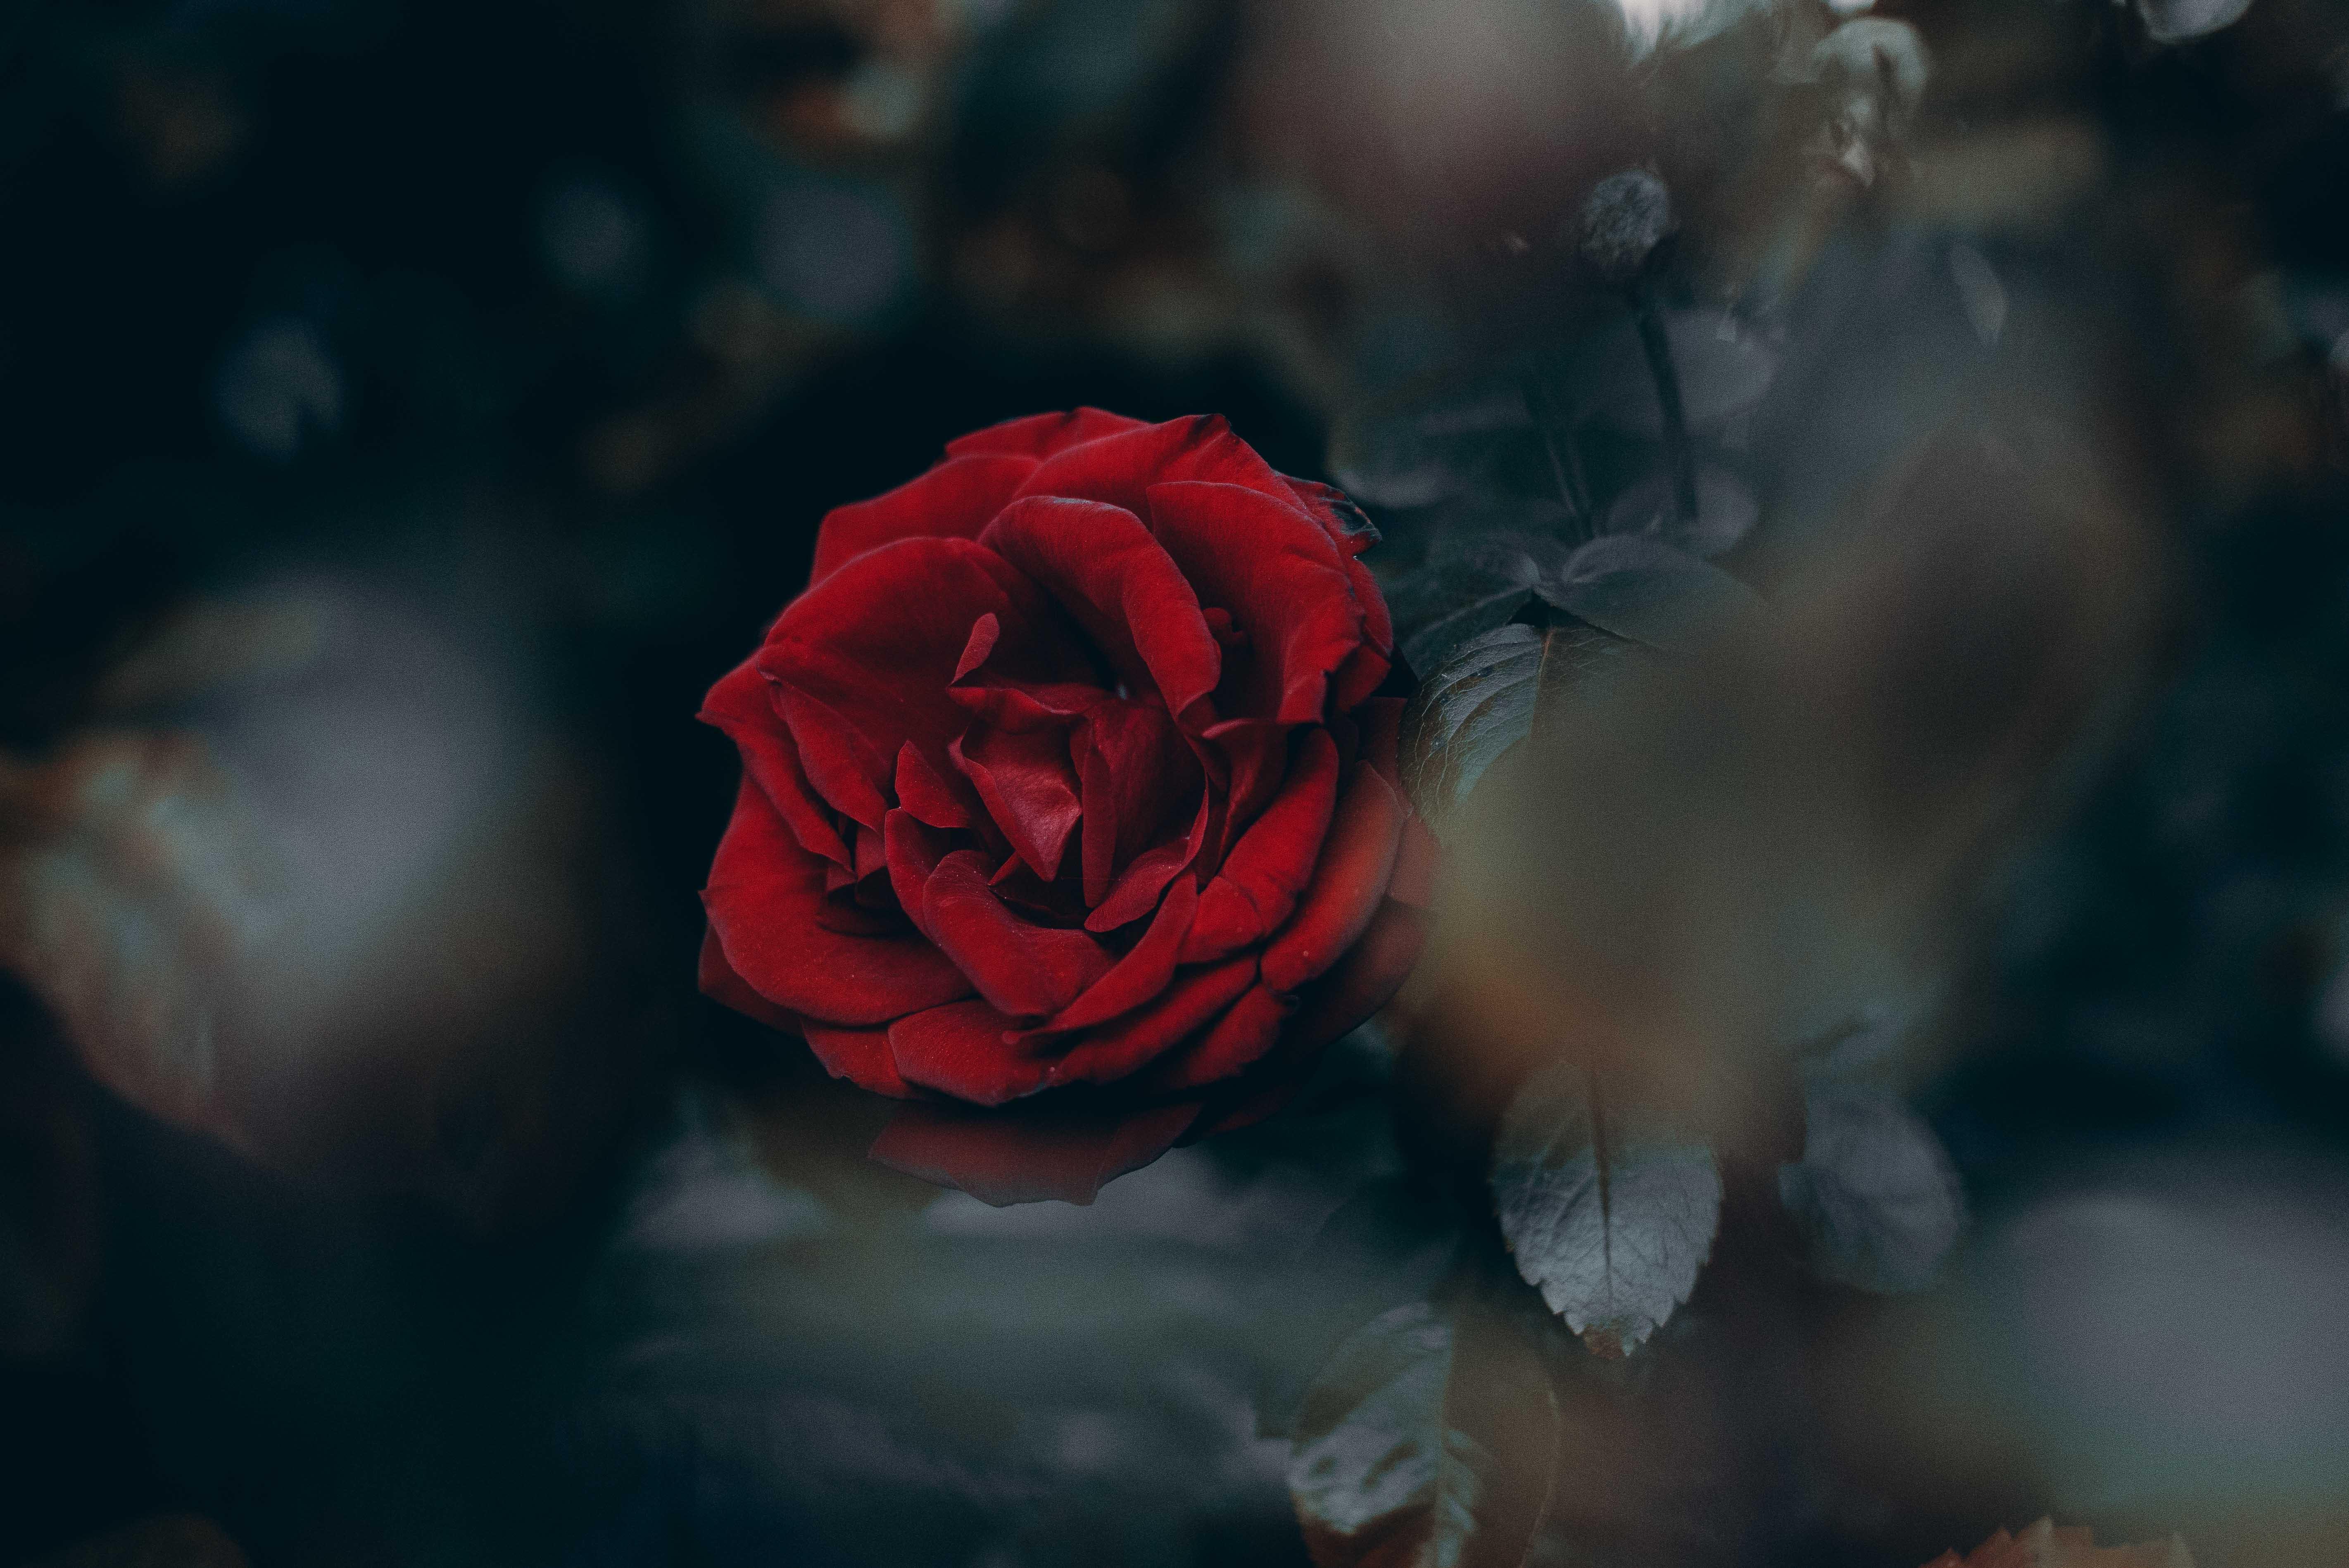 tilt-shift photography of red rose